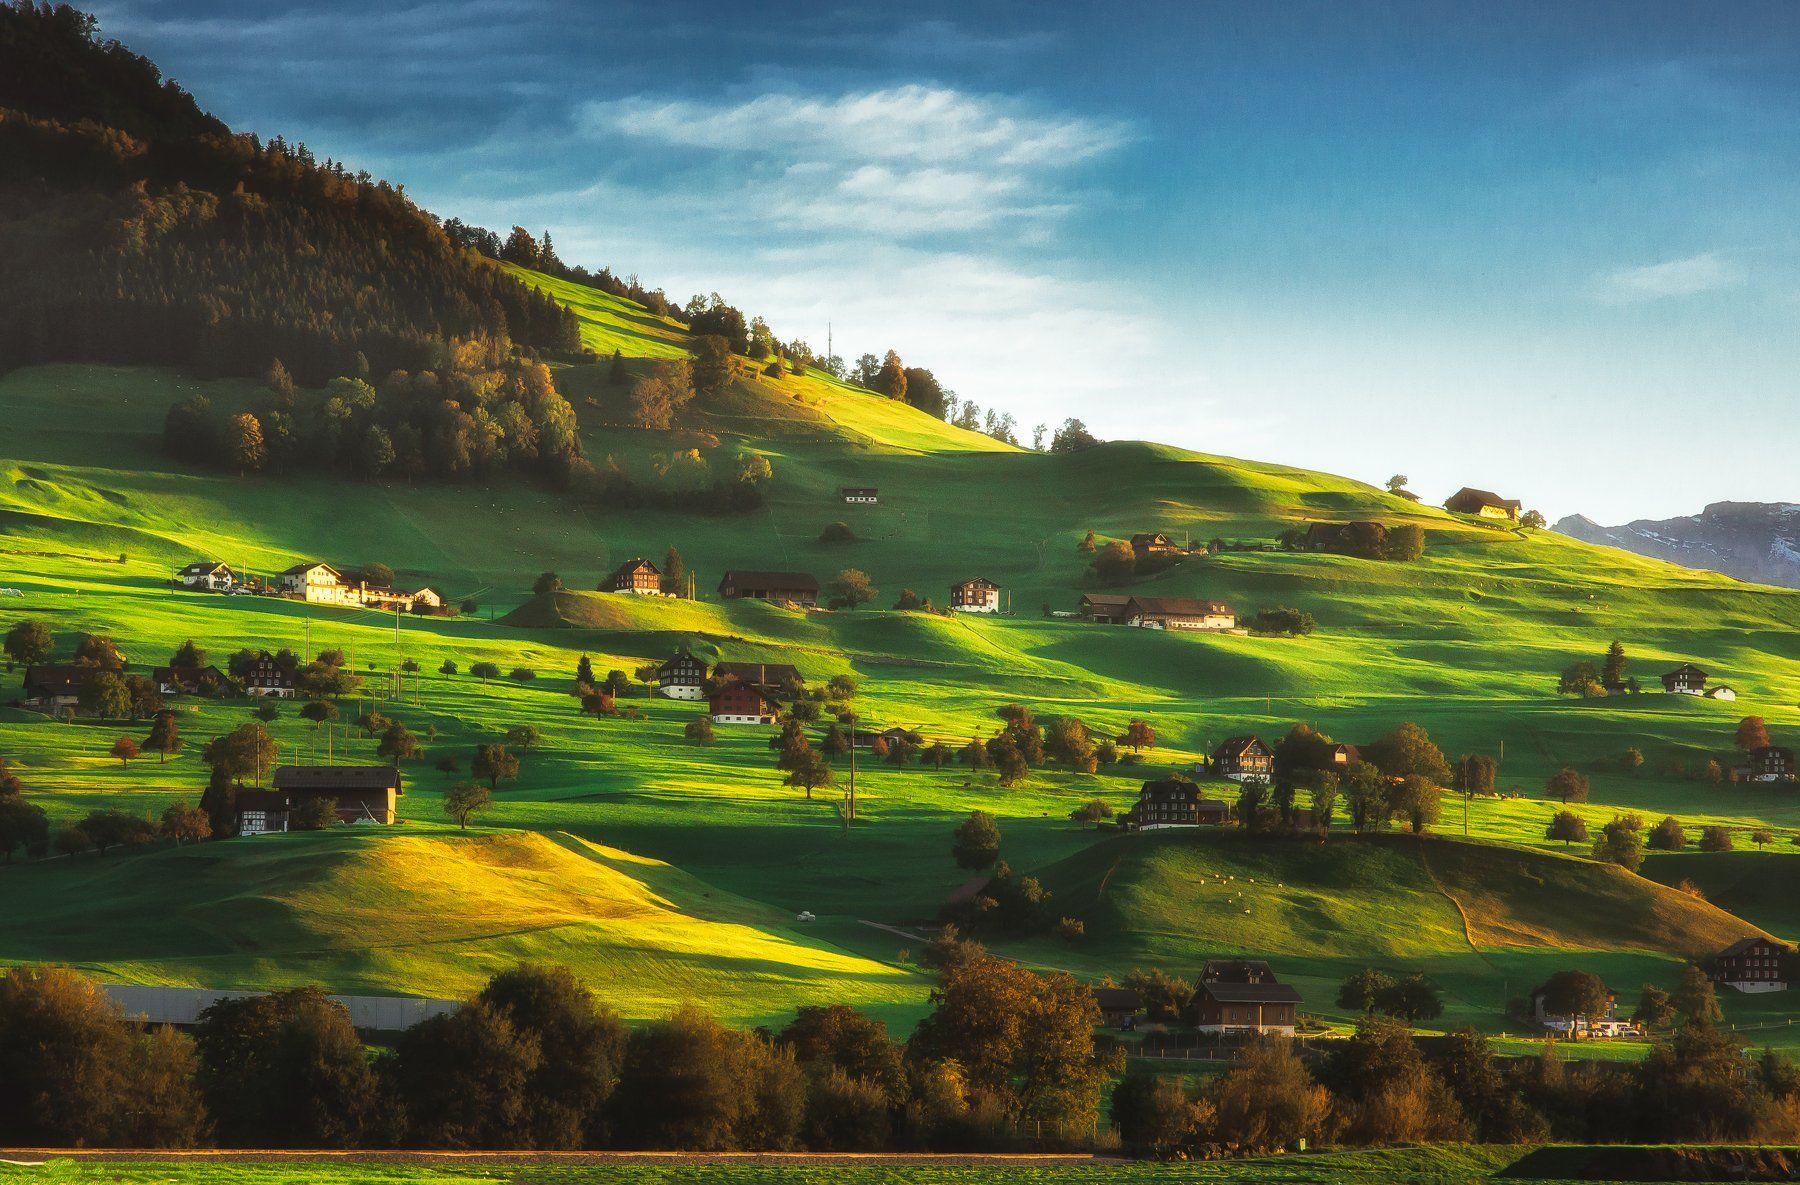 landscape.hills,light,swiss,nature, Olegs Bucis